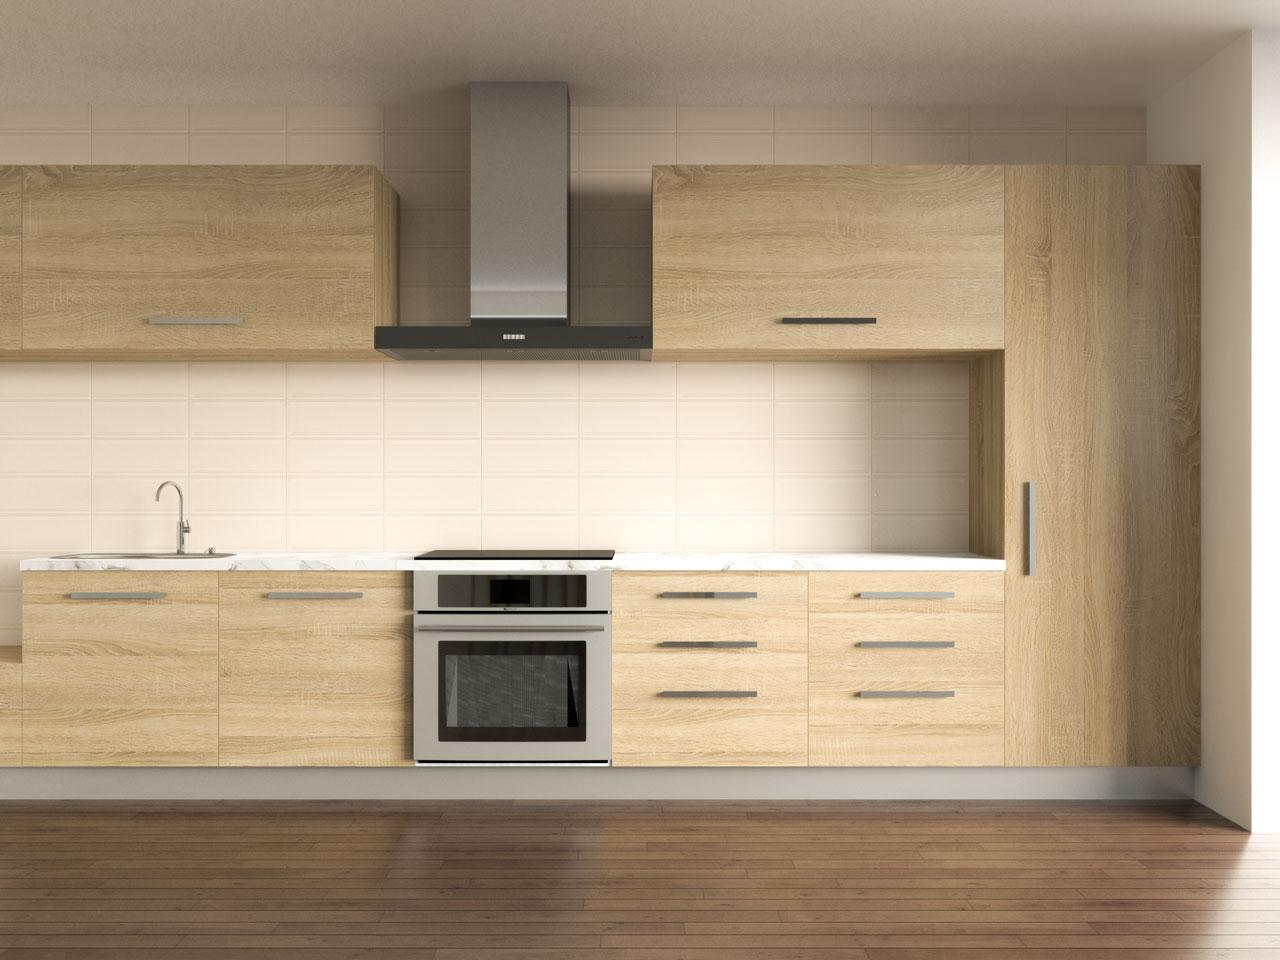 White coffee backsplash with oak cabinets